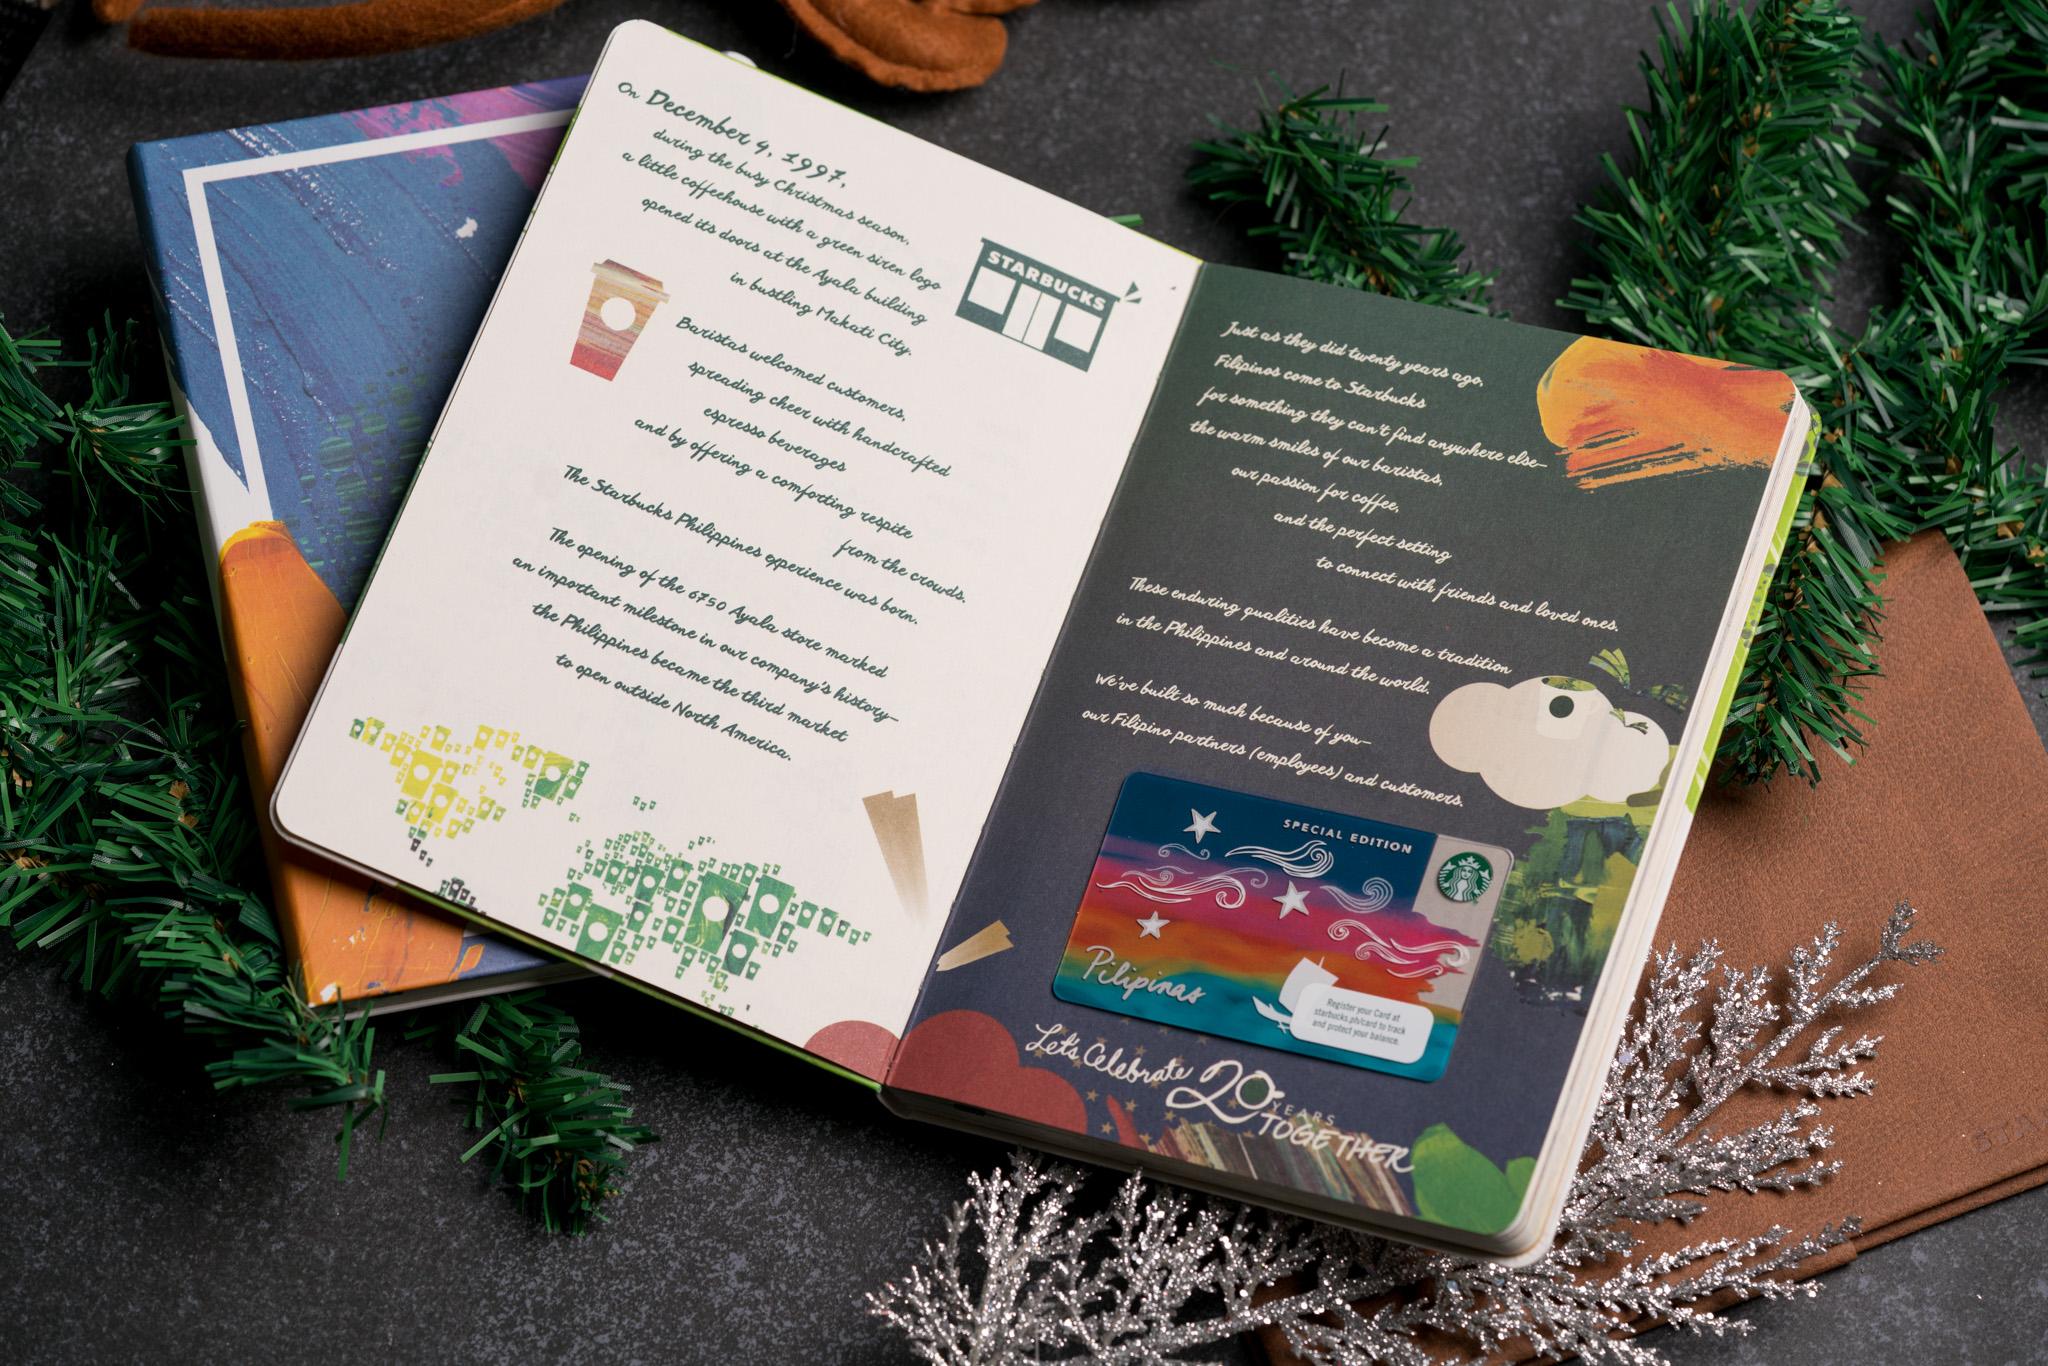 IN PHOTOS: Starbucks PH's 2018 planner